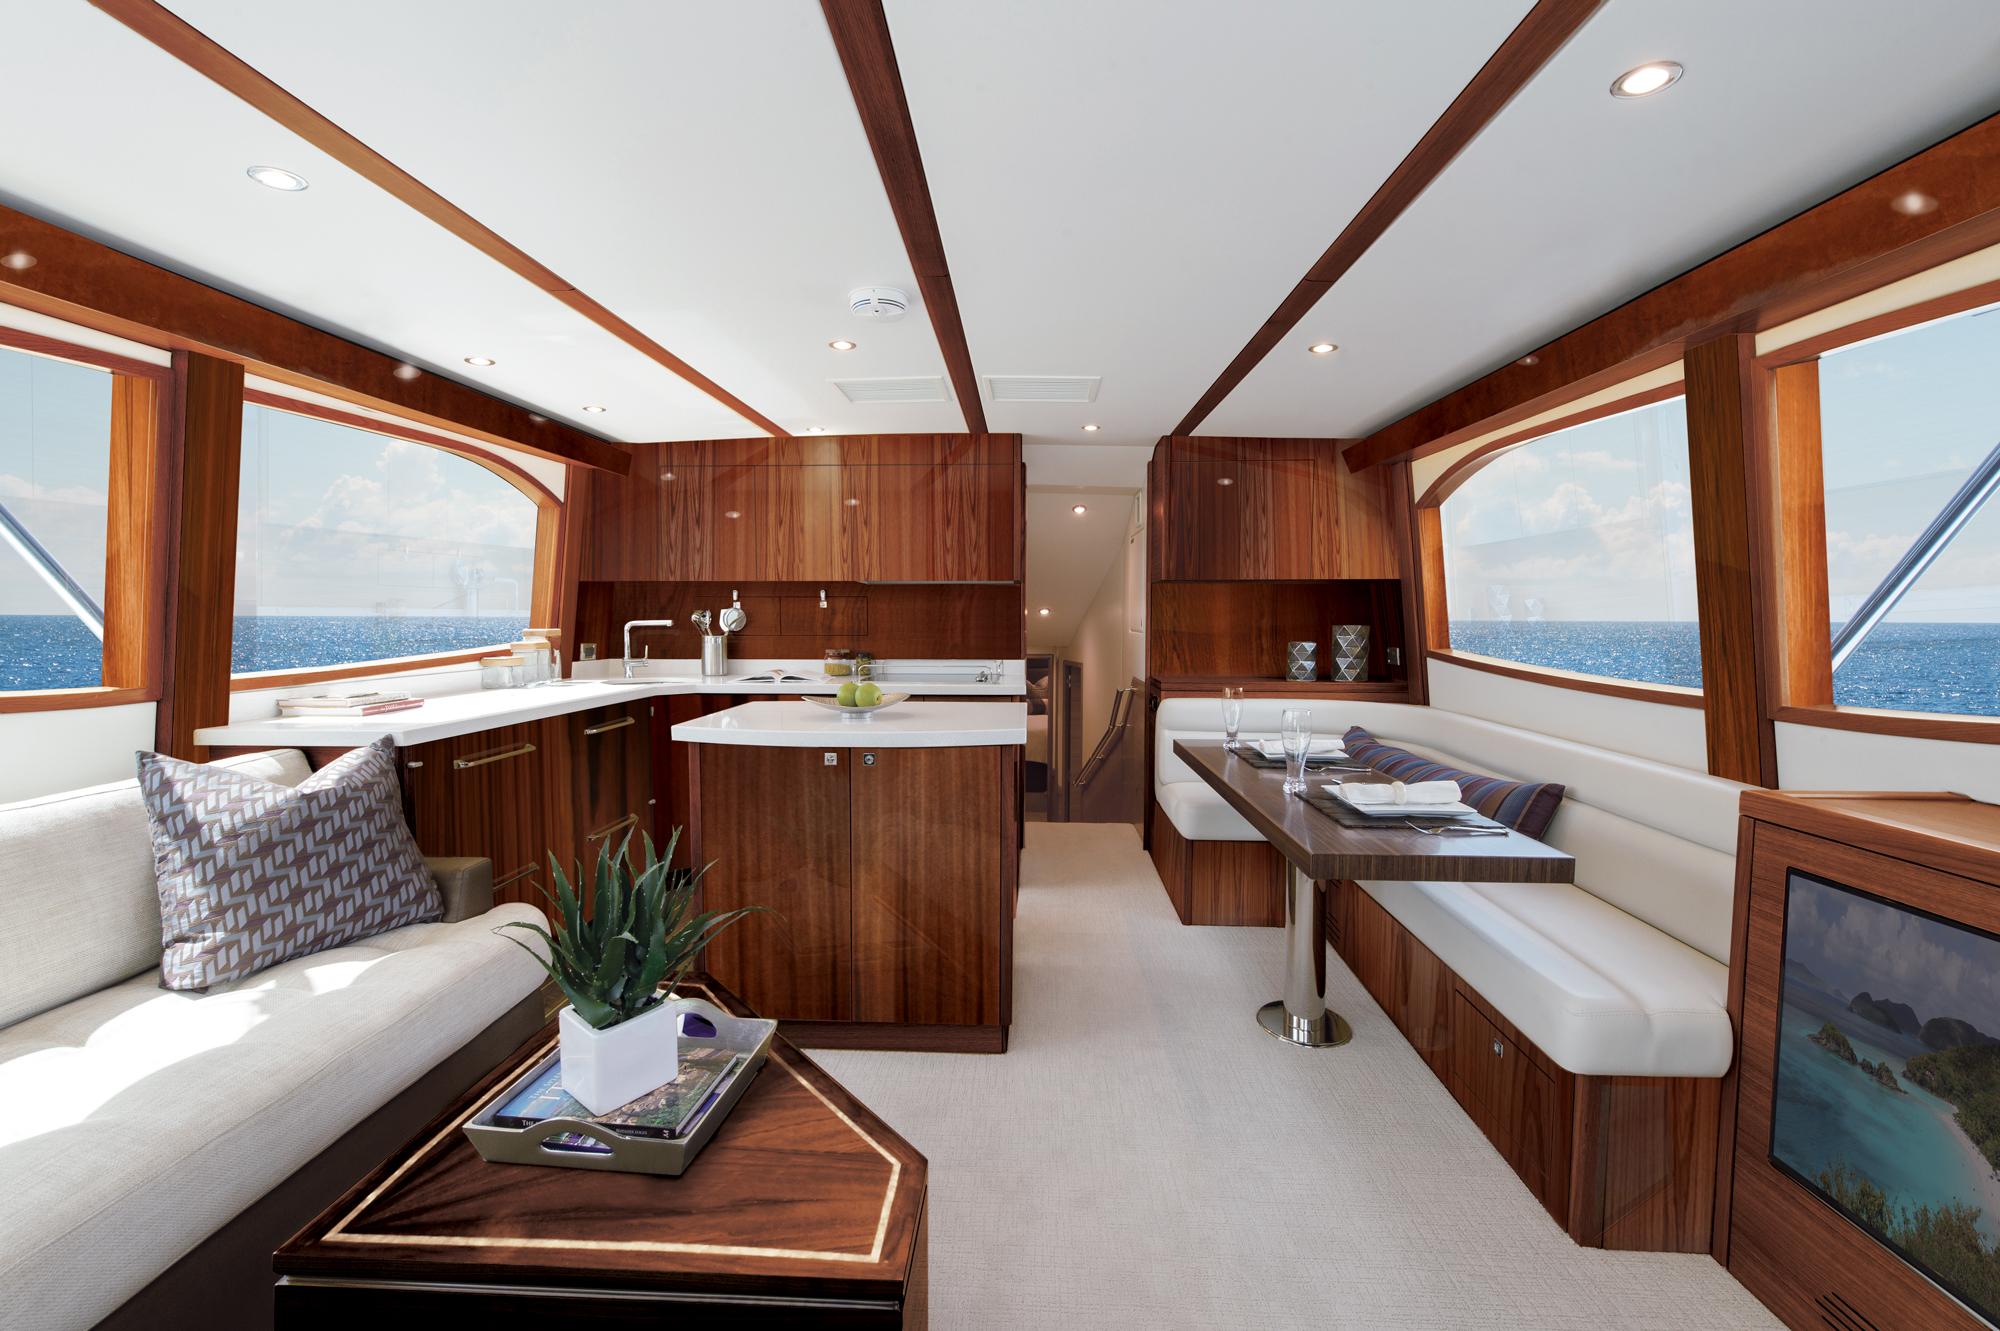 GALLERY. Hatteras GT 54 sport fishing yacht